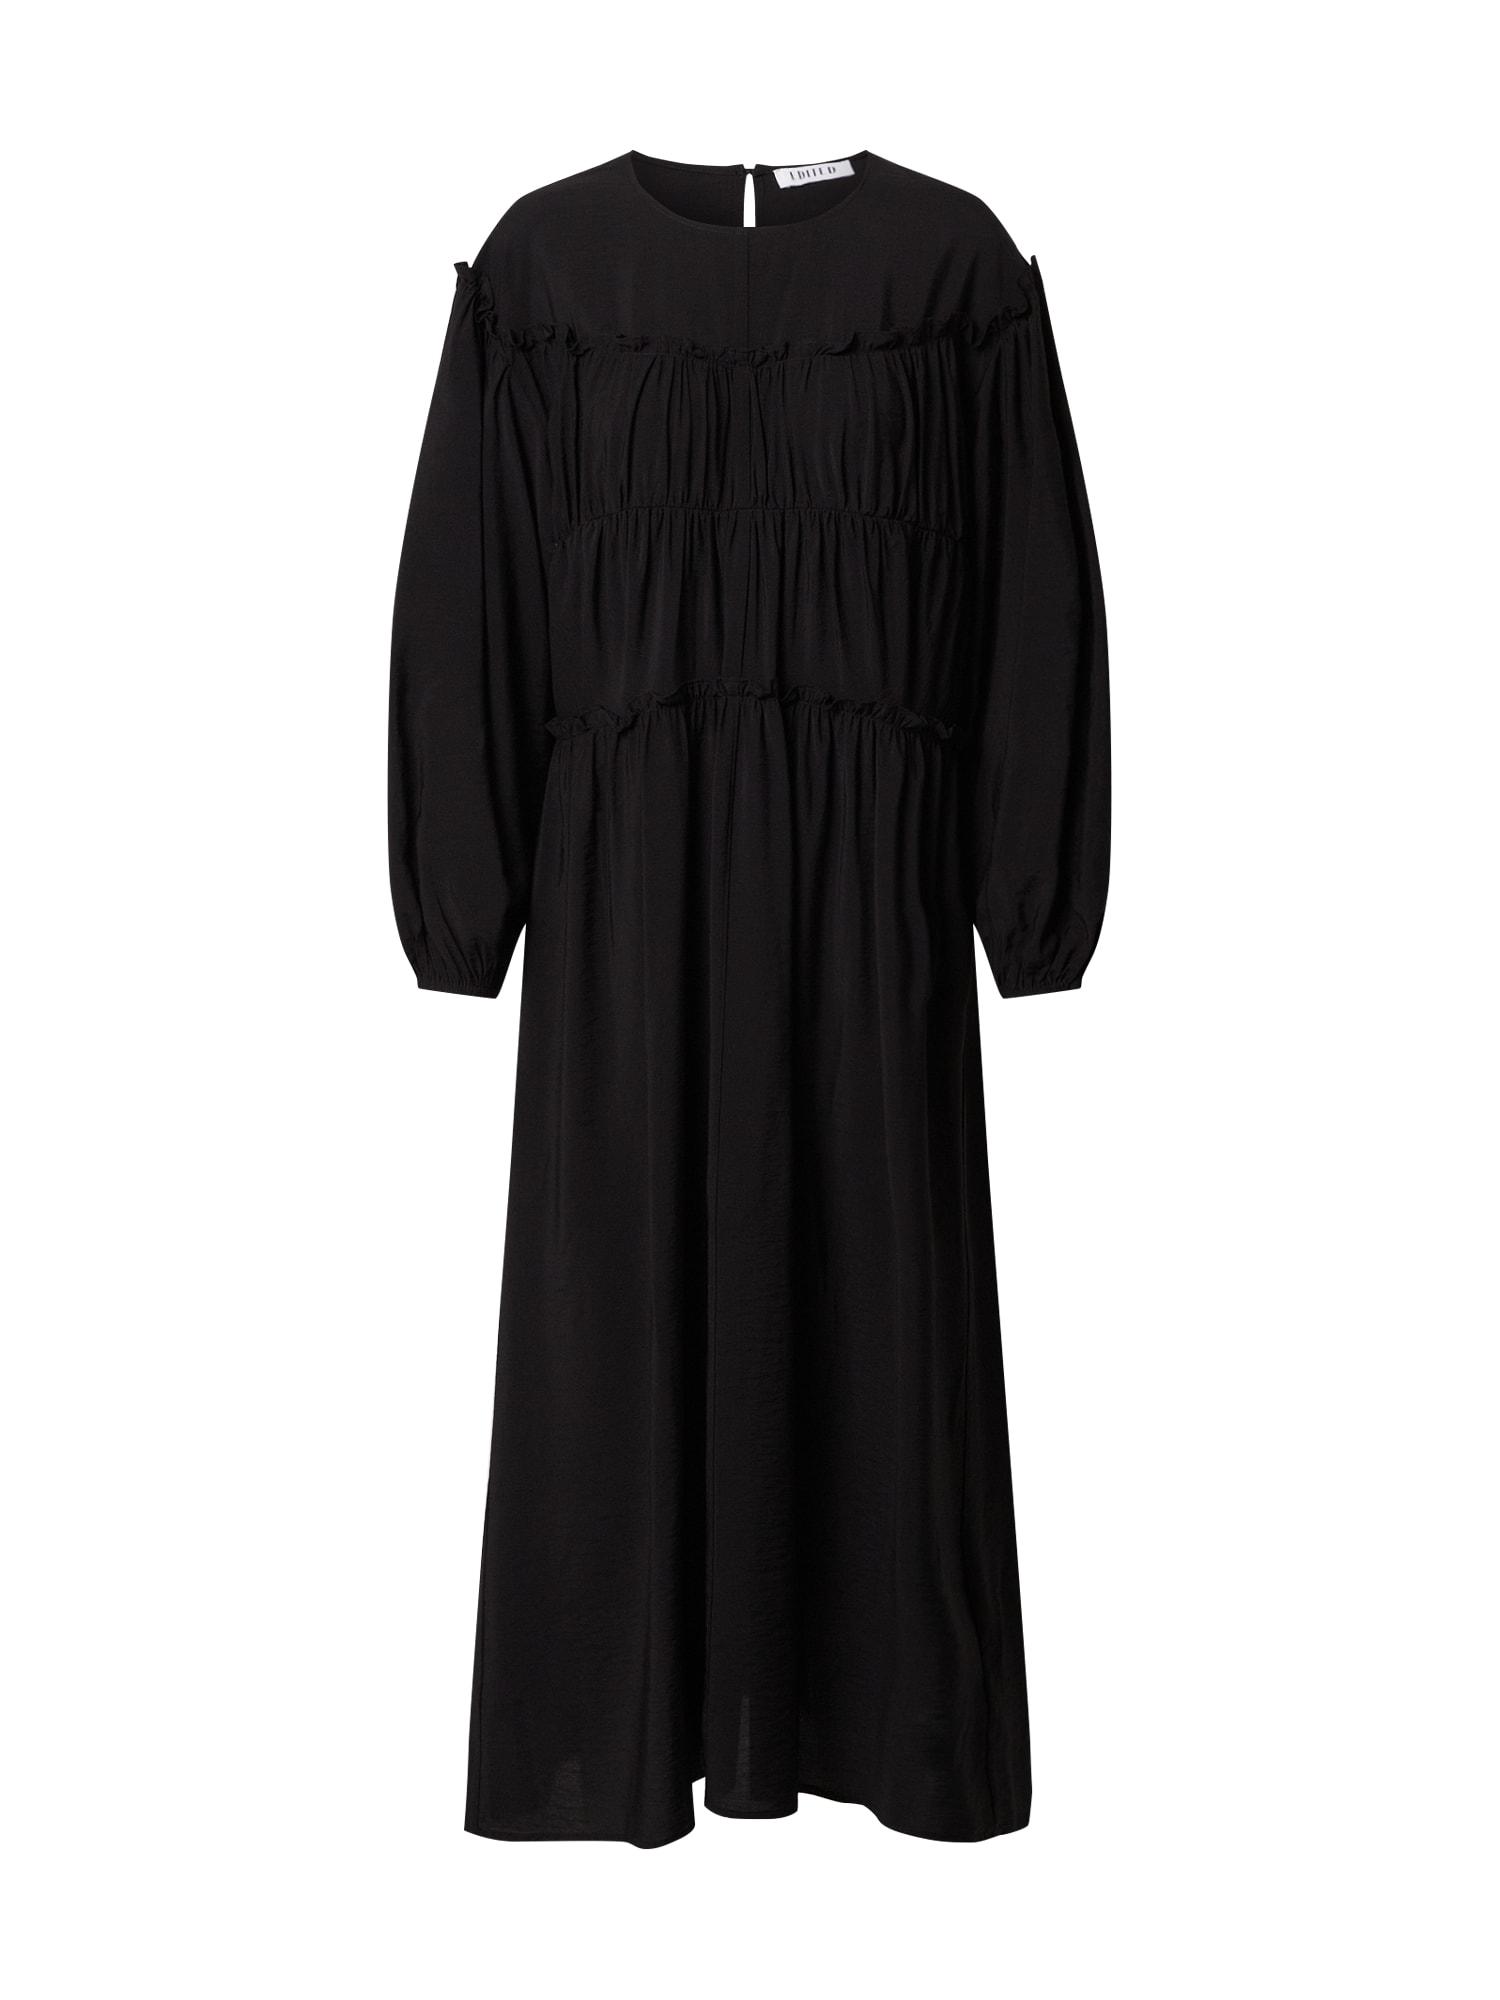 EDITED Suknelė 'Canice' juoda